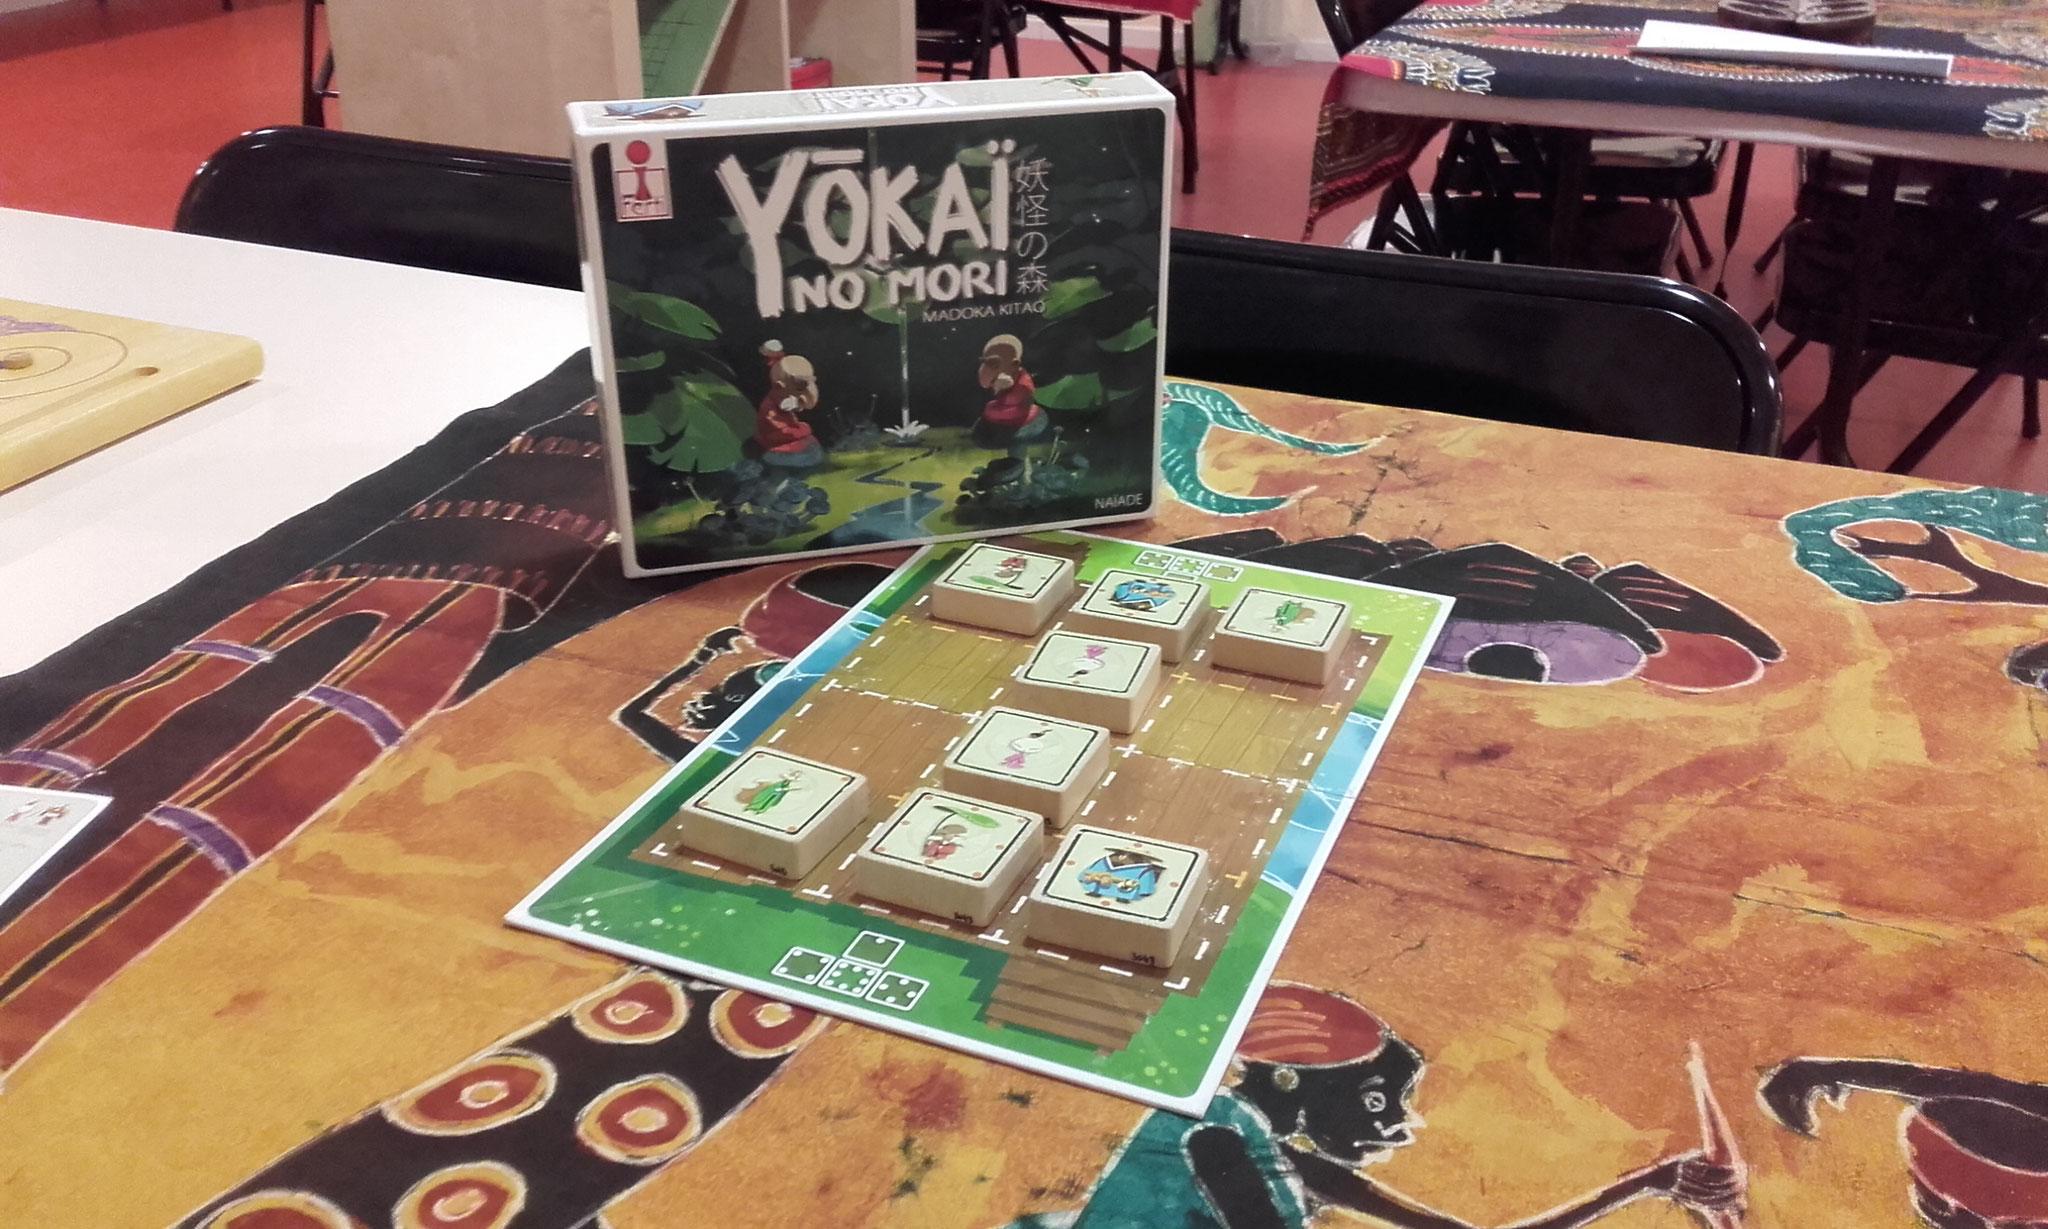 Yokai no mori, jeu d'initiation au Shogi (échecs japonais)